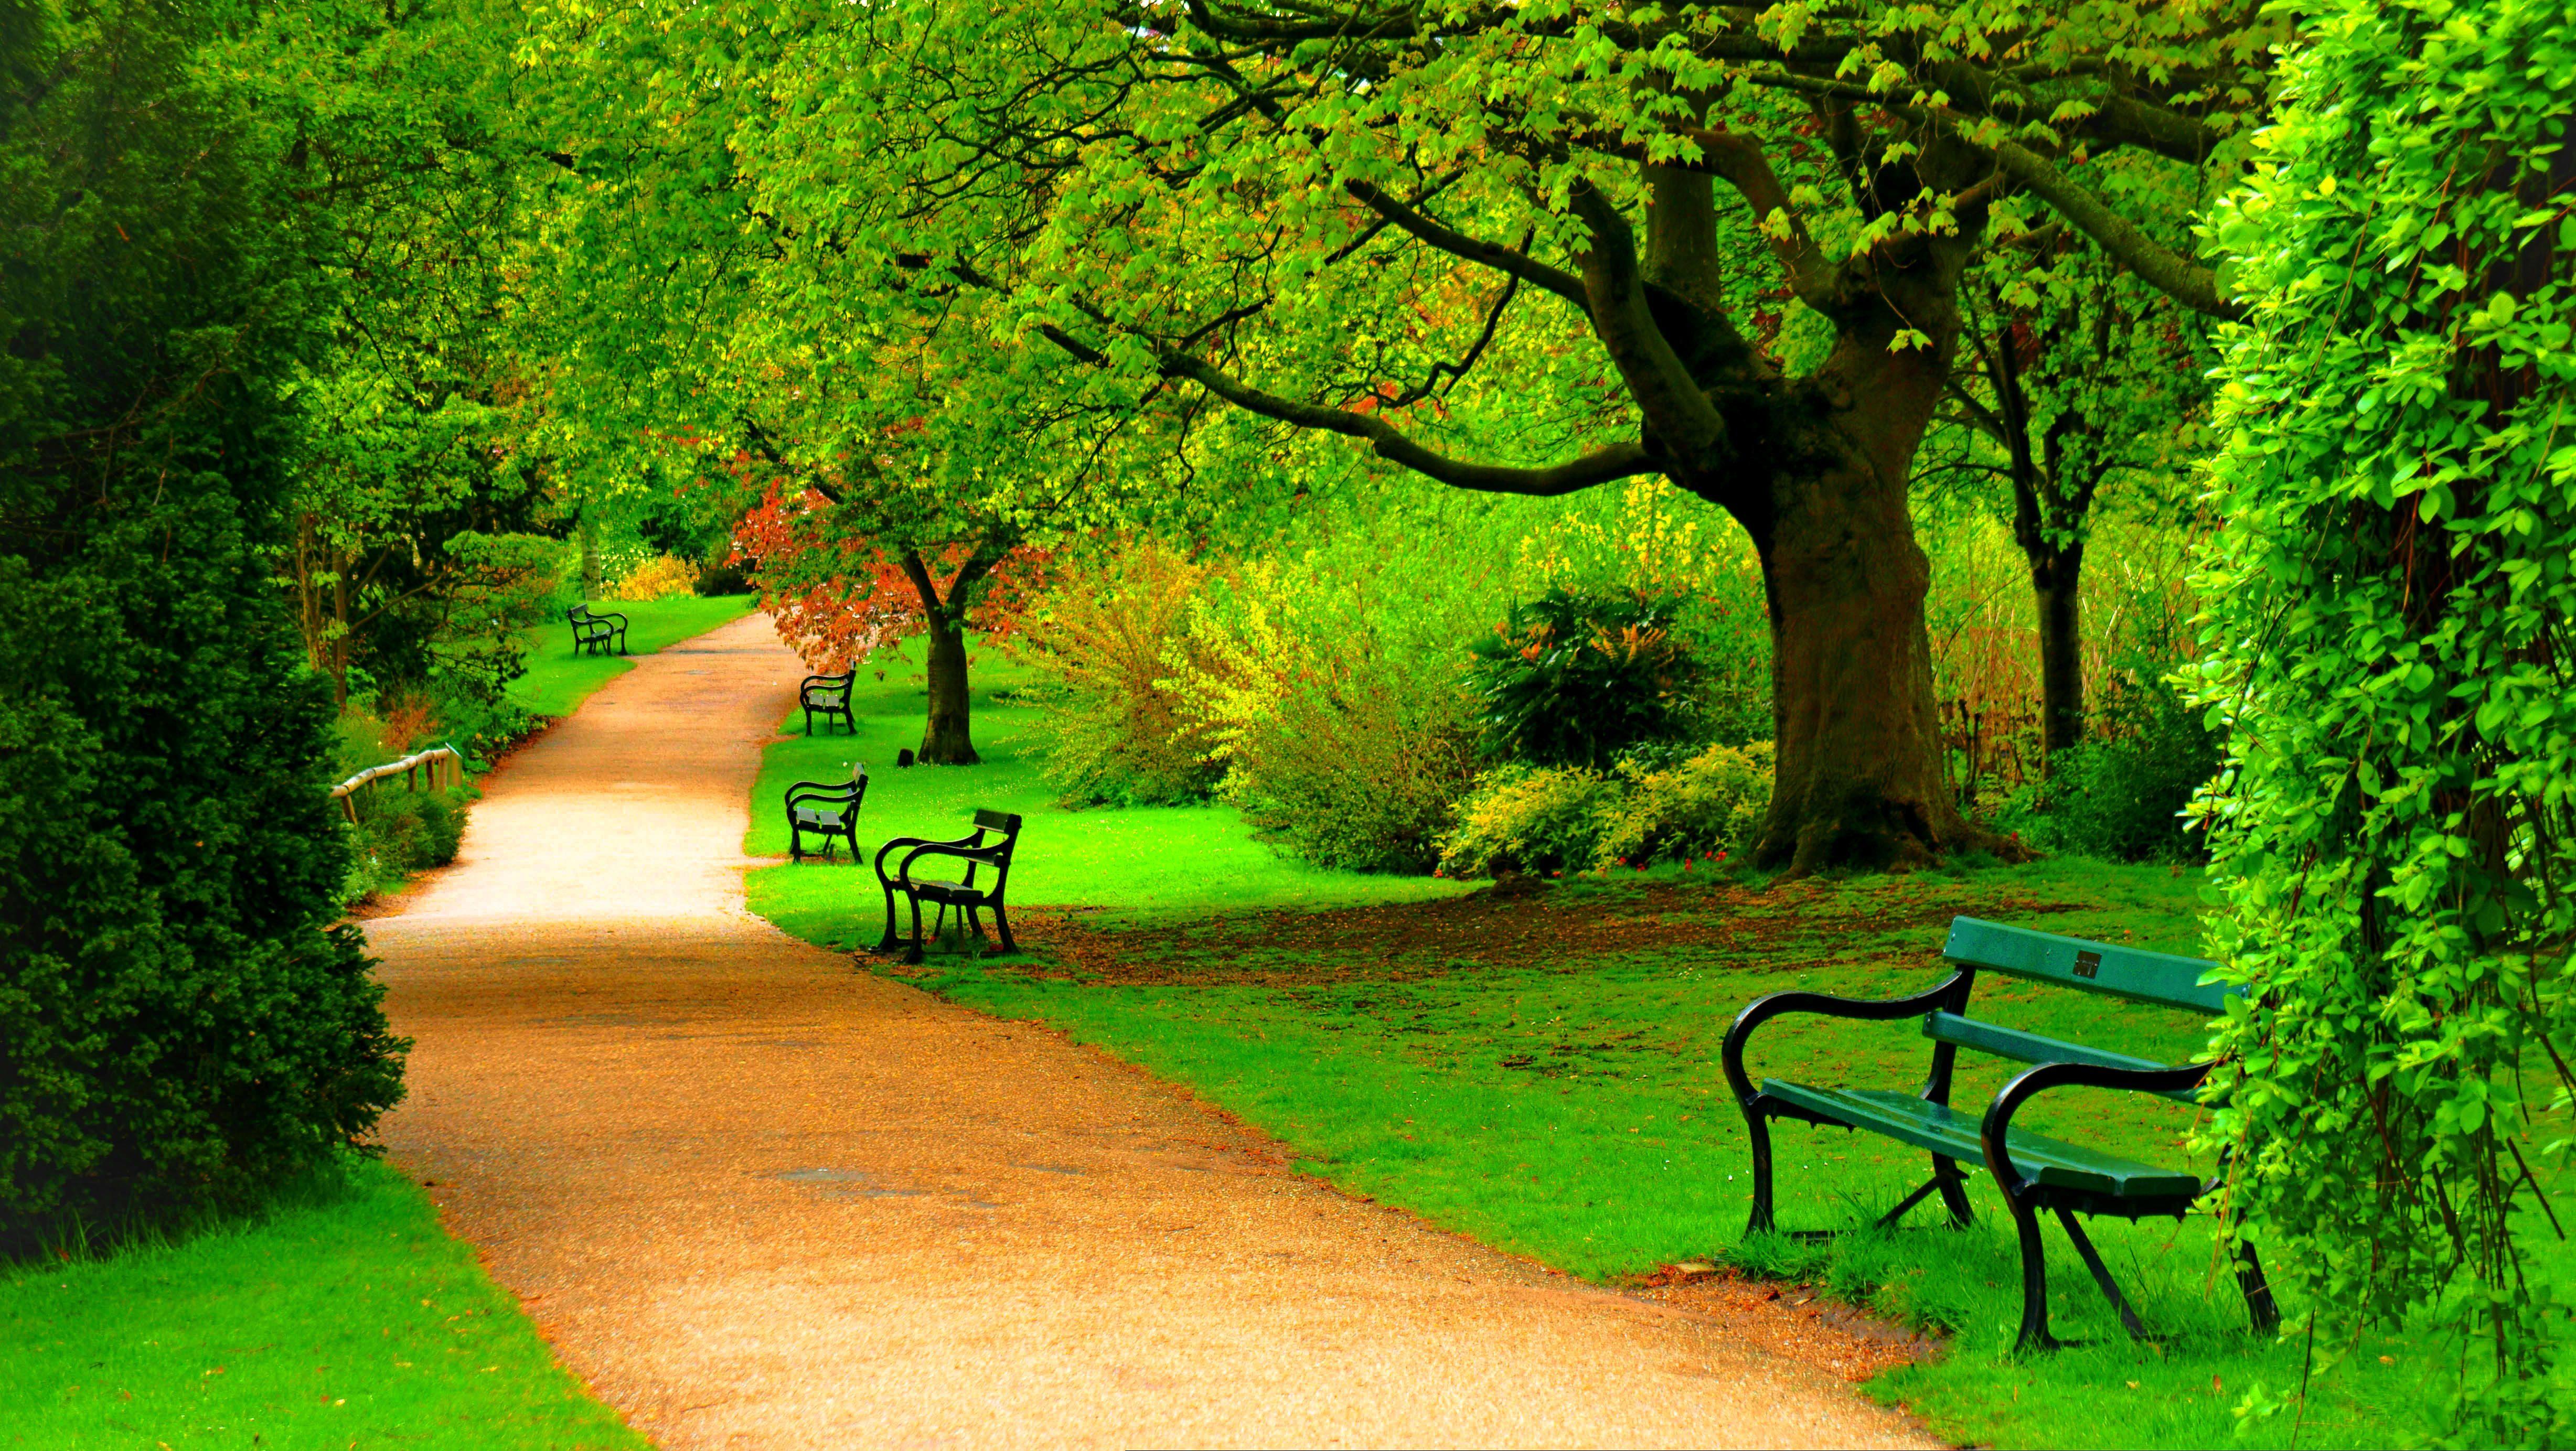 Nature Park Road